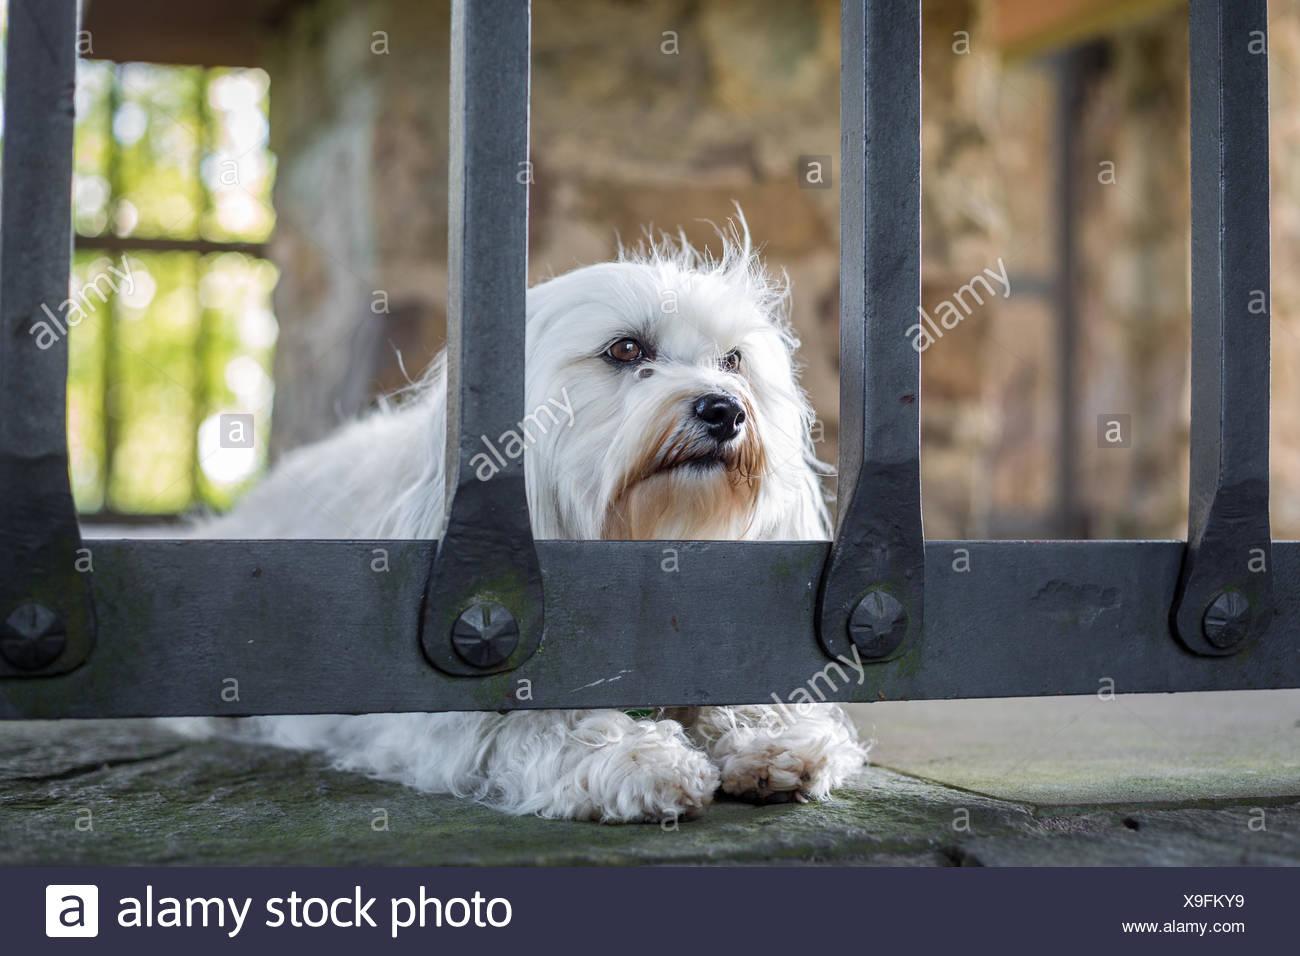 Imprisoned - Stock Image